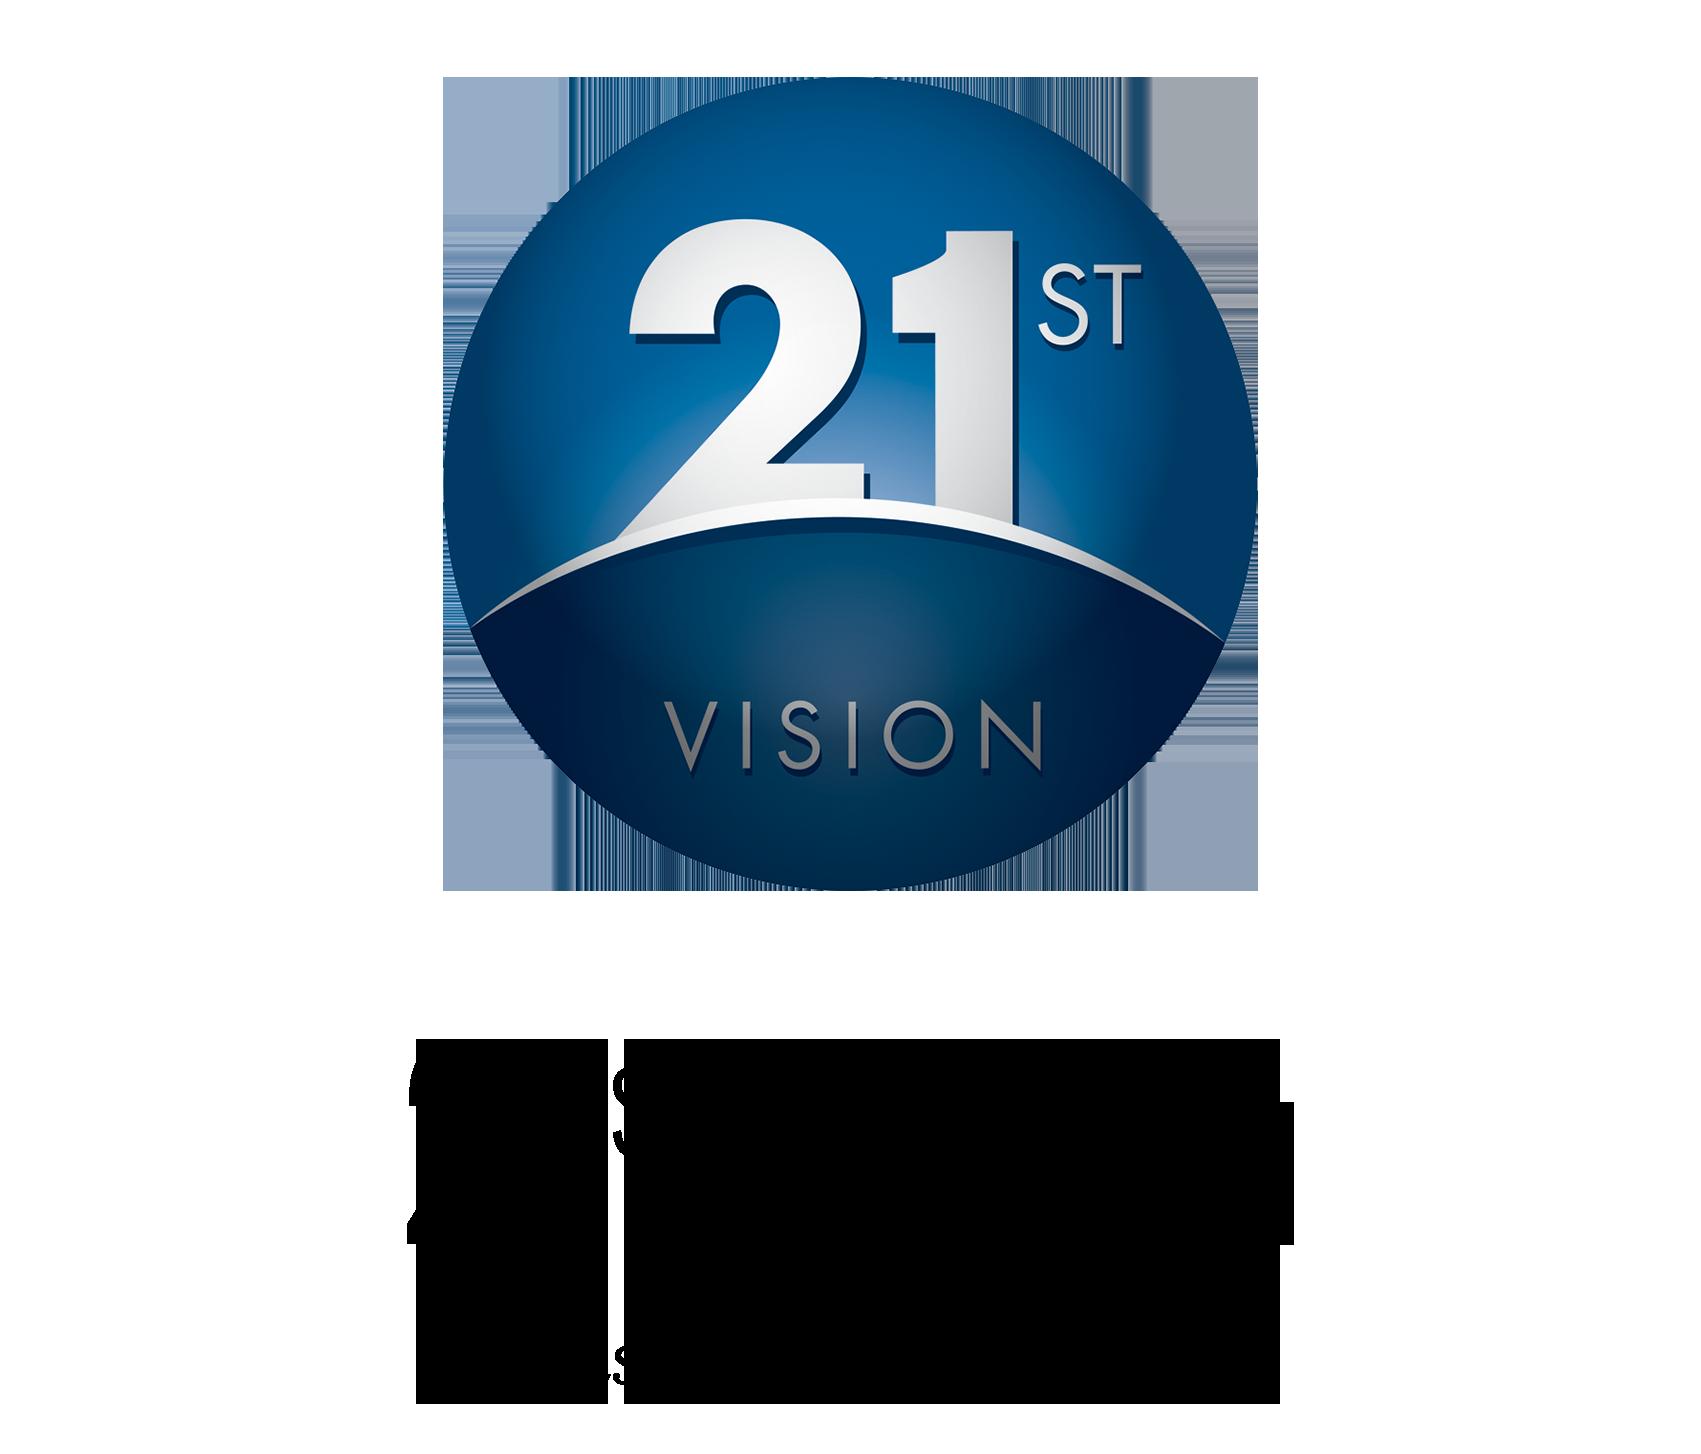 21st Vision